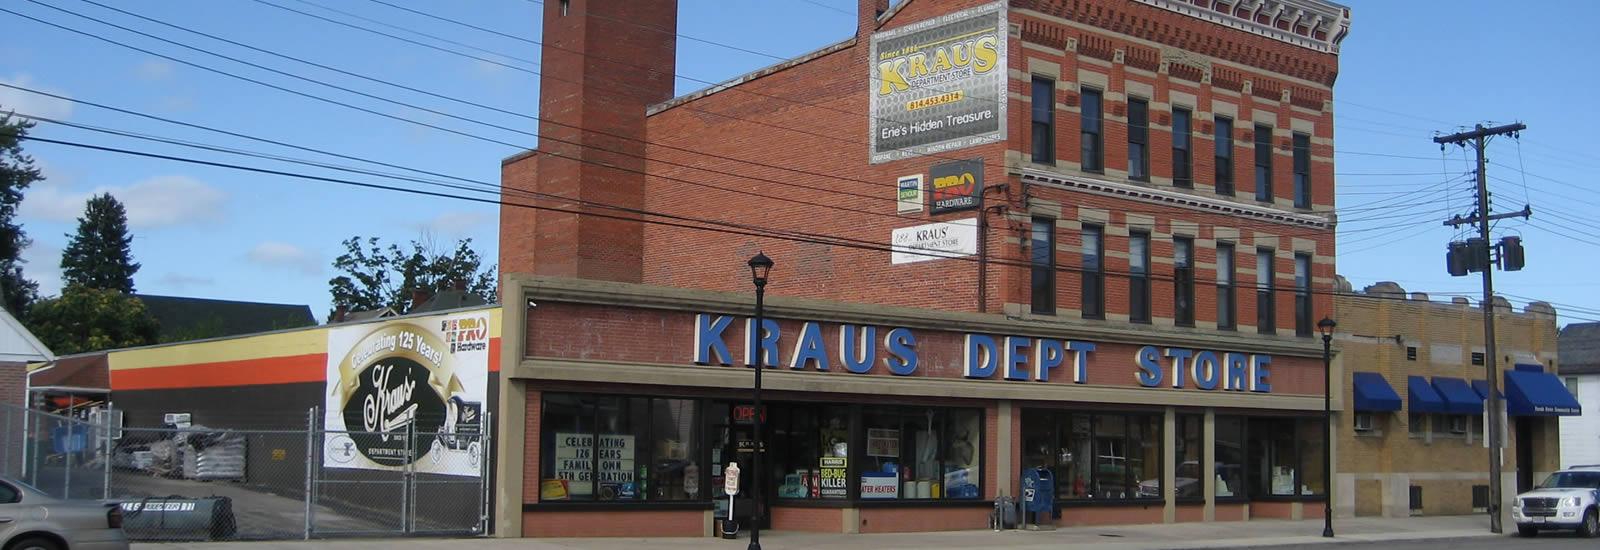 Kraus Department Store